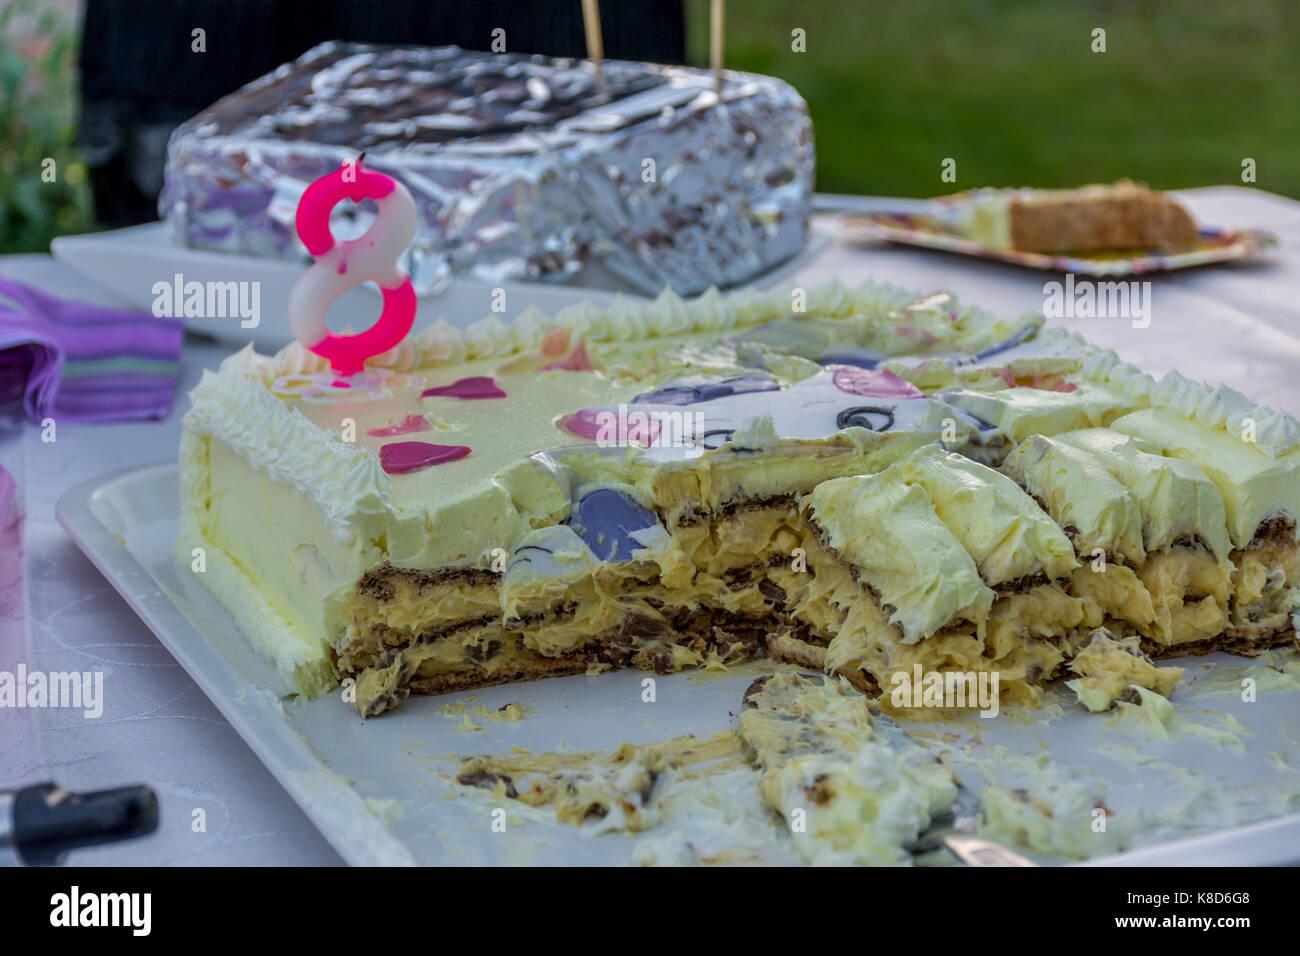 Fantastic Birthday Cake For 8 Year Old Girl Stock Photo 160101096 Alamy Funny Birthday Cards Online Chimdamsfinfo